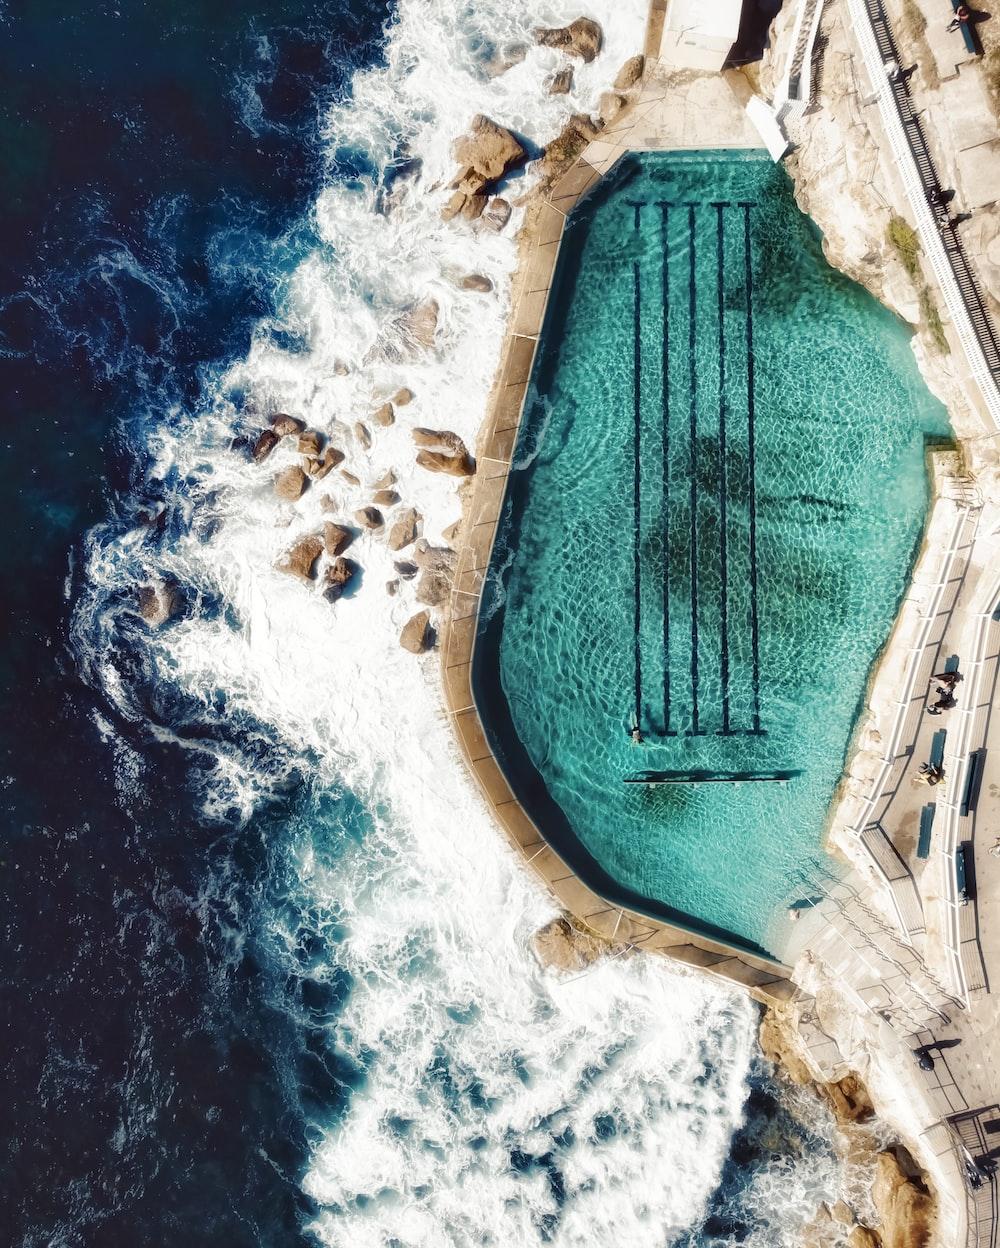 Bronte beach ocean pool | HD photo by Emjeii Beattie (@emjeiiamira